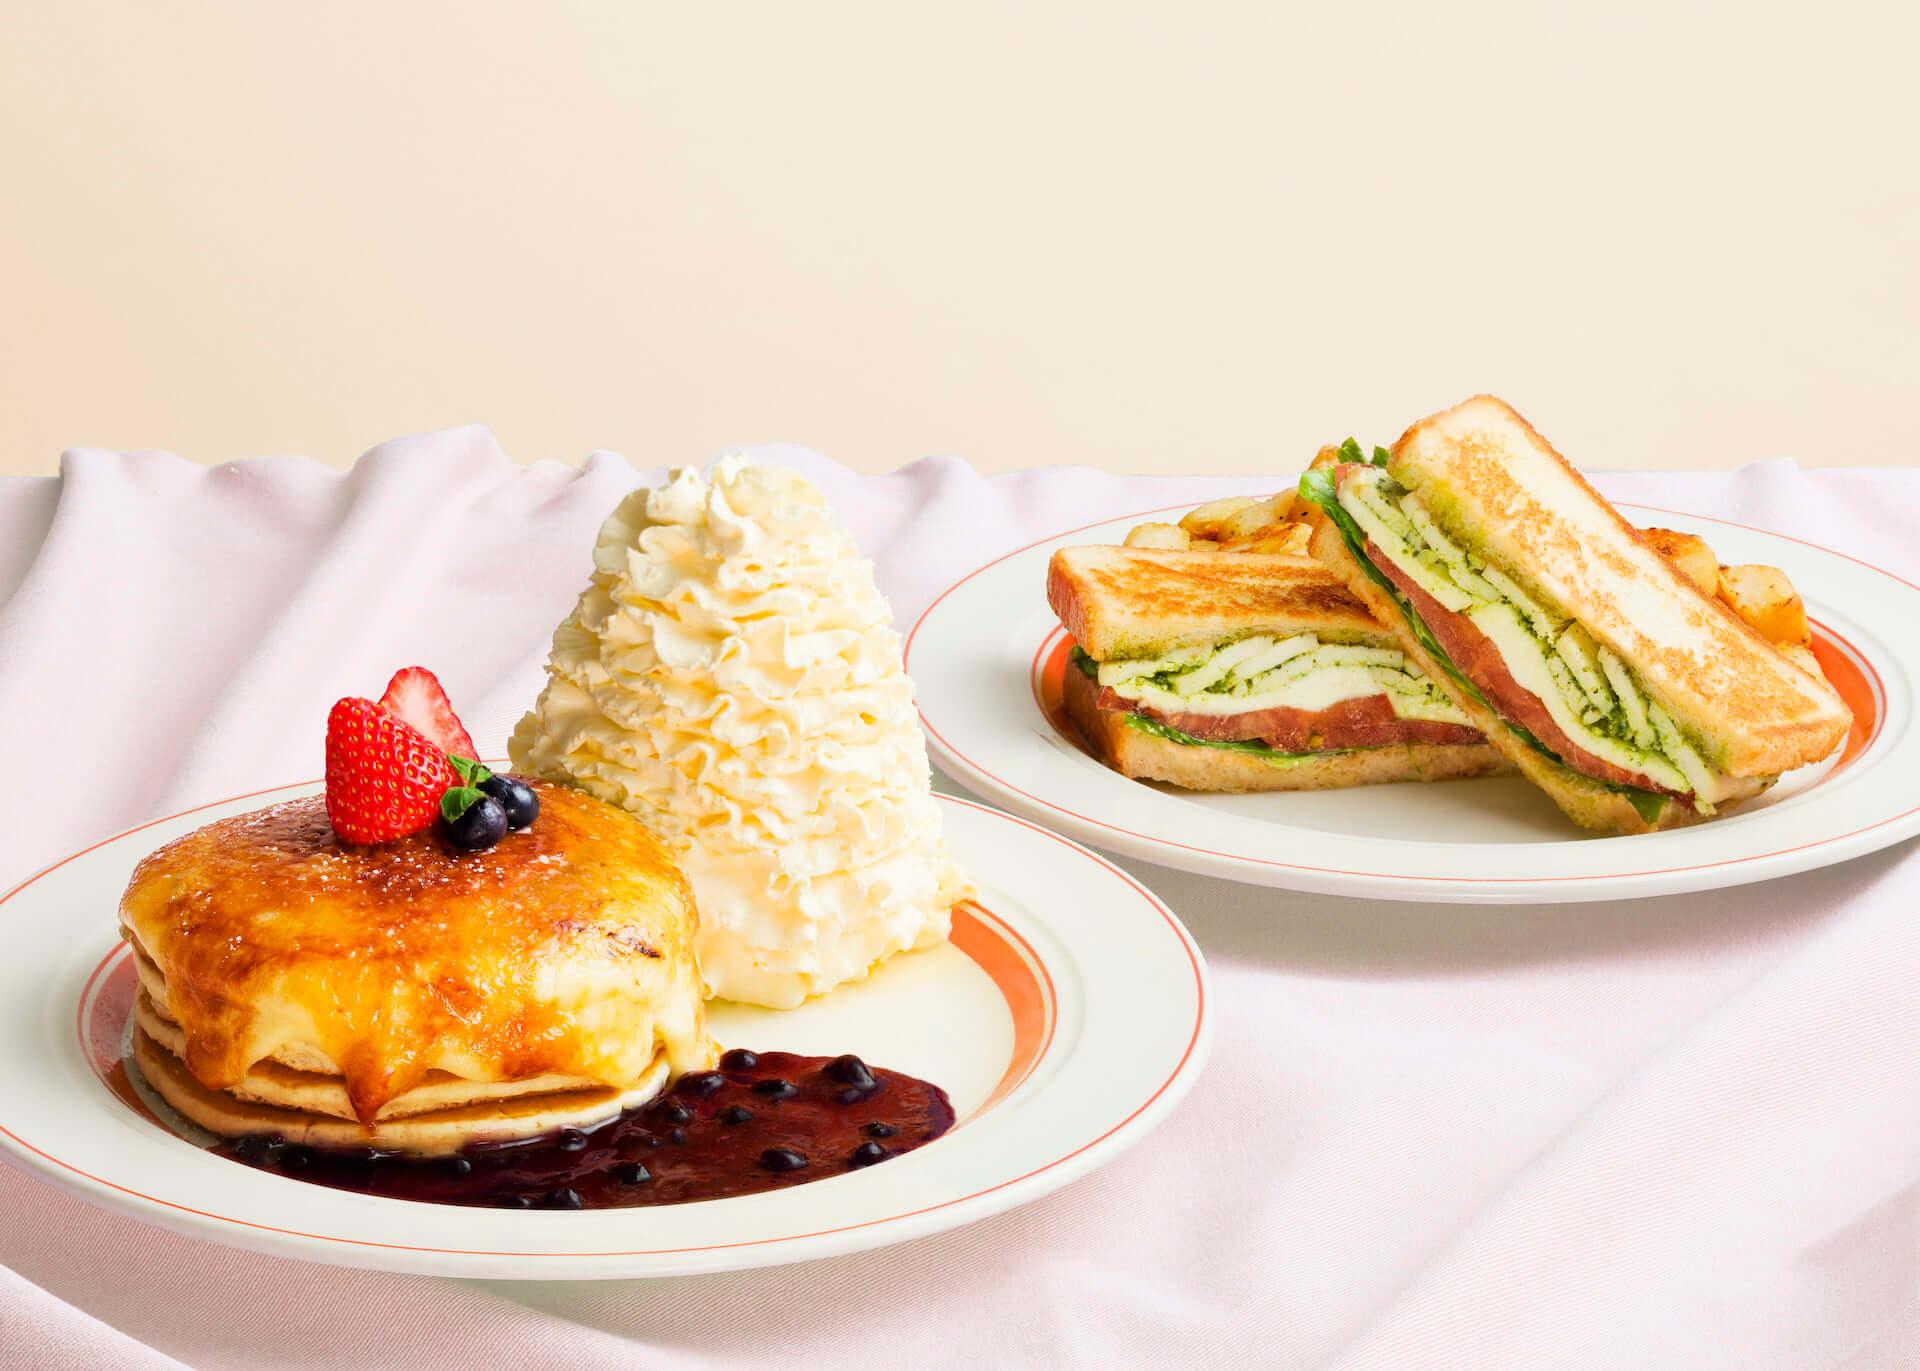 Eggs'n Thingsから、季節限定『クリームチーズのブリュレパンケーキ』『モッツァレラチーズとバジルチキンのホットサンド』が登場! gourmet200604_eggsnthings_07-1920x1371